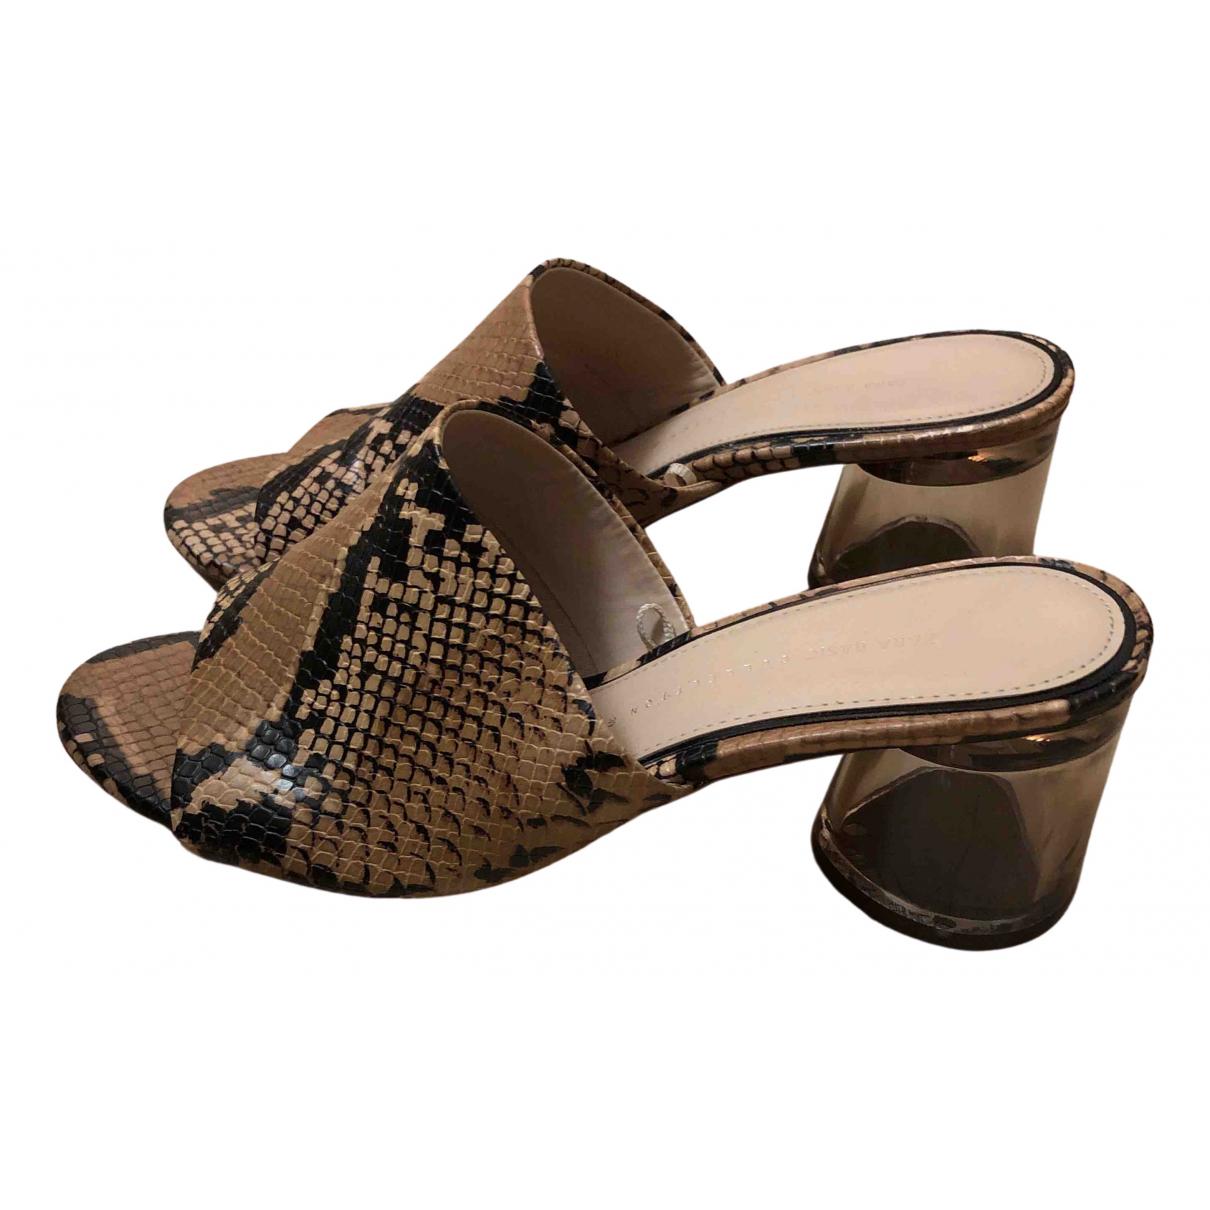 Zara \N Khaki Pony-style calfskin Mules & Clogs for Women 39 EU